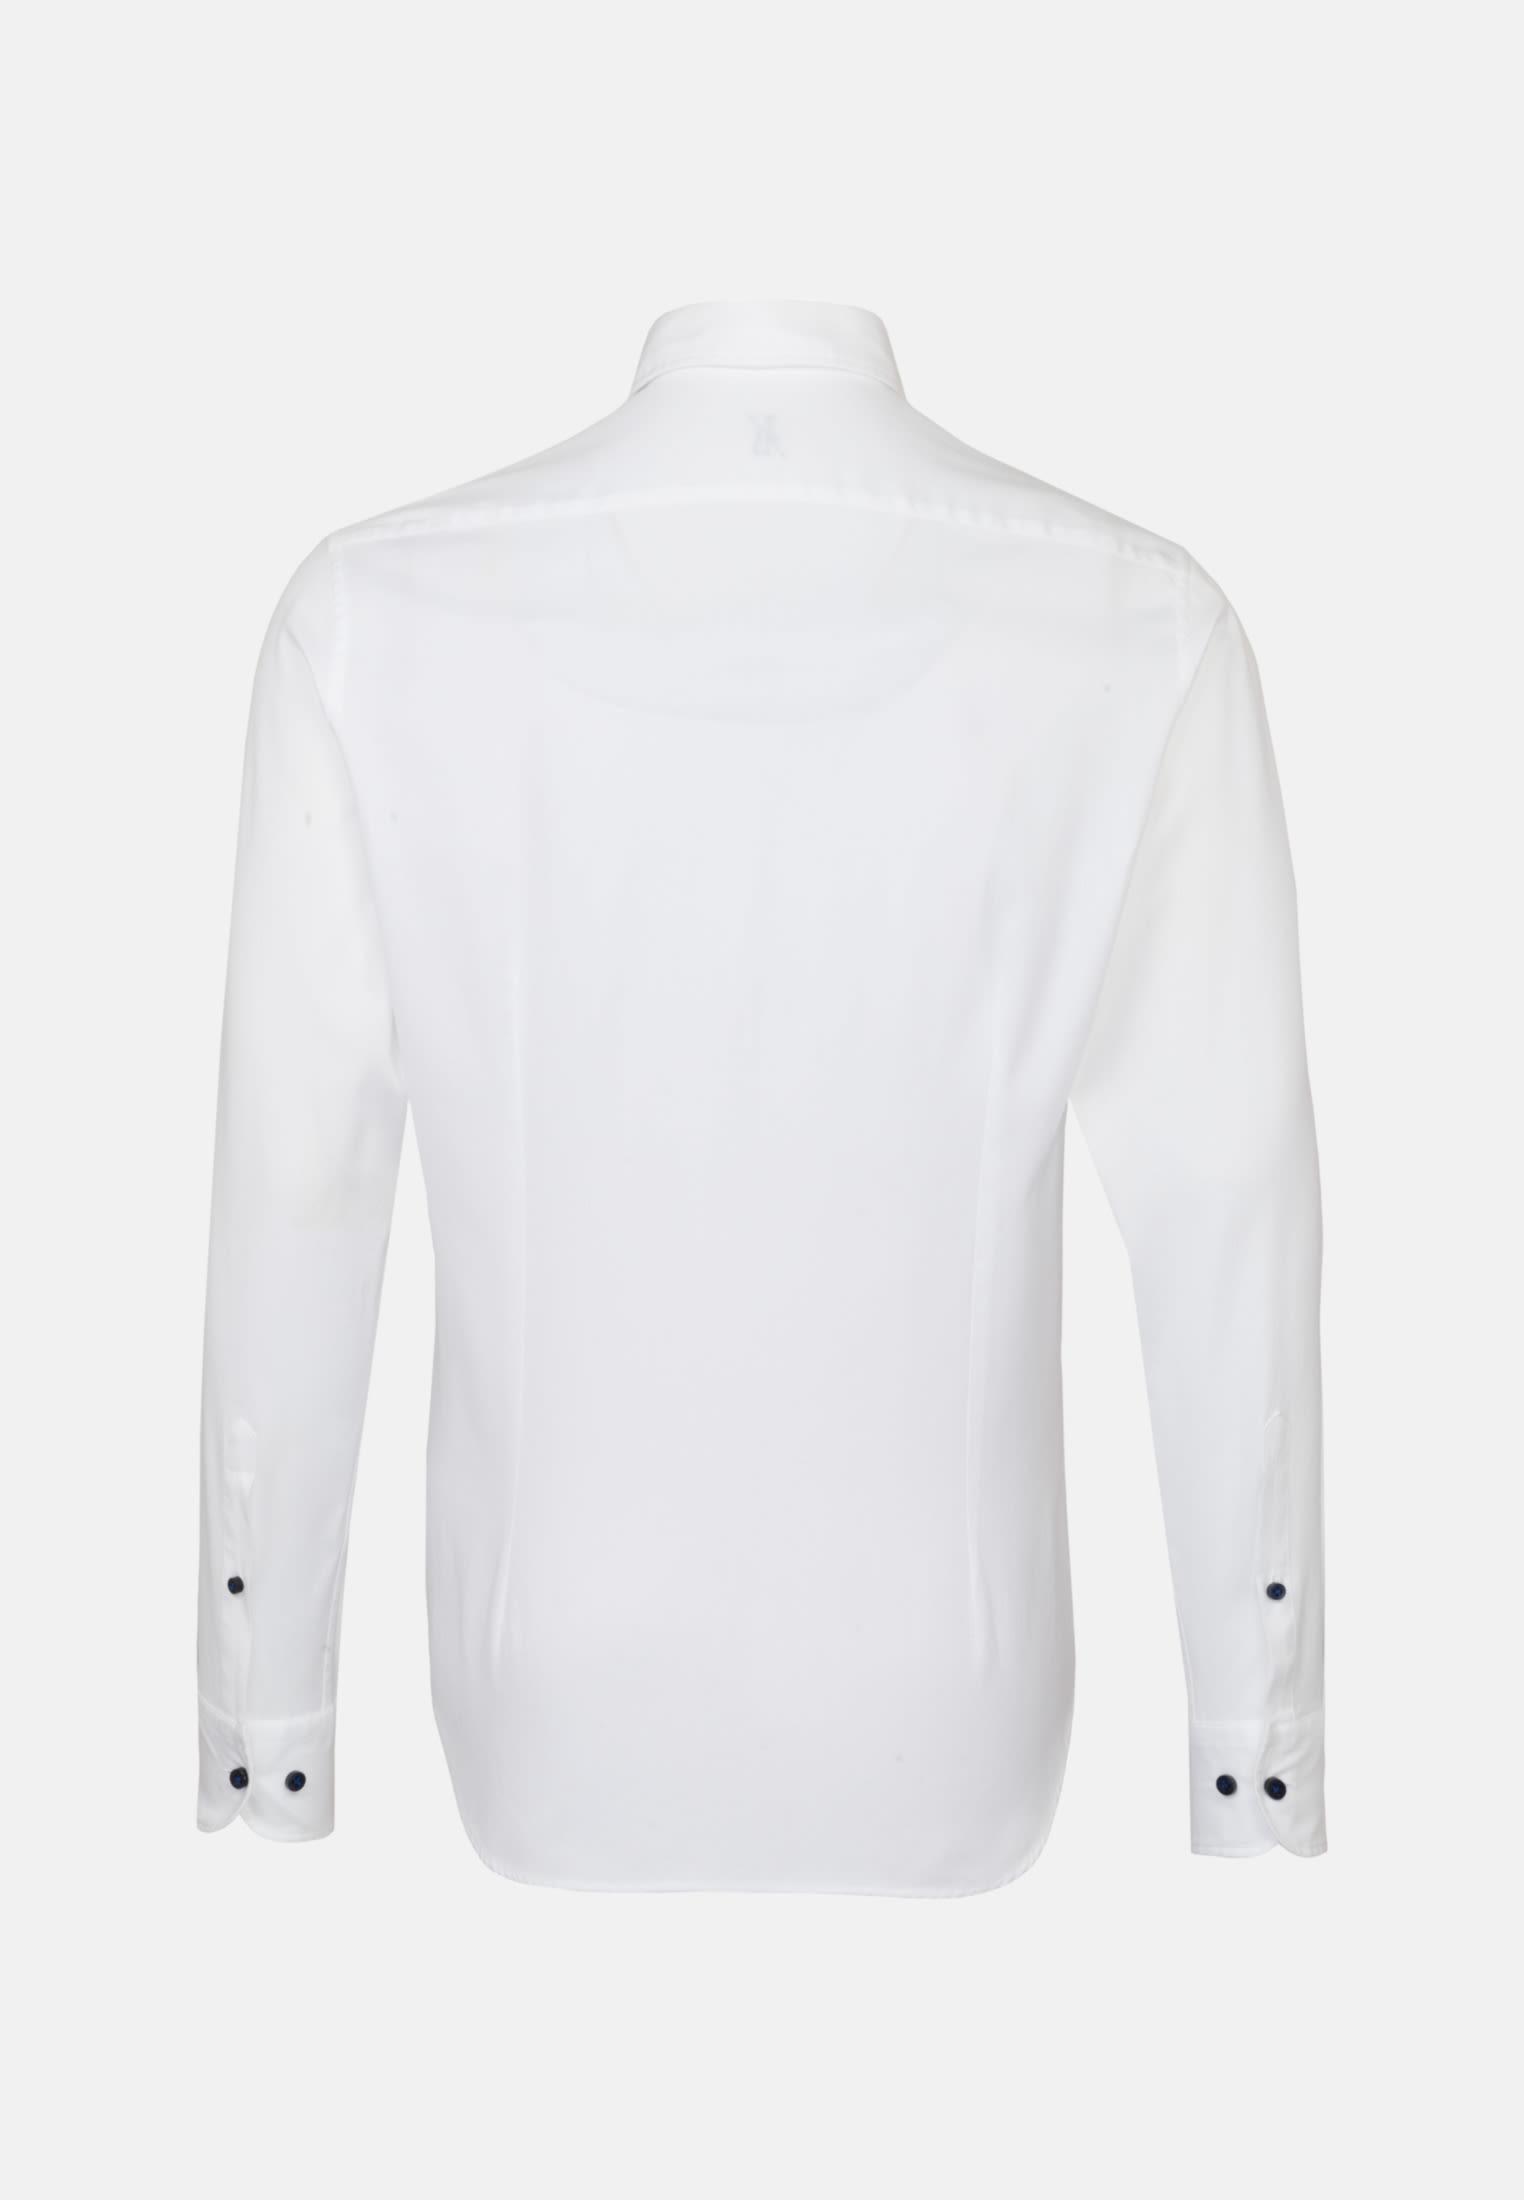 Dobby Smart Casual Hemd in Perfect Fit mit Haifischkragen in Weiß    Jacques Britt Onlineshop